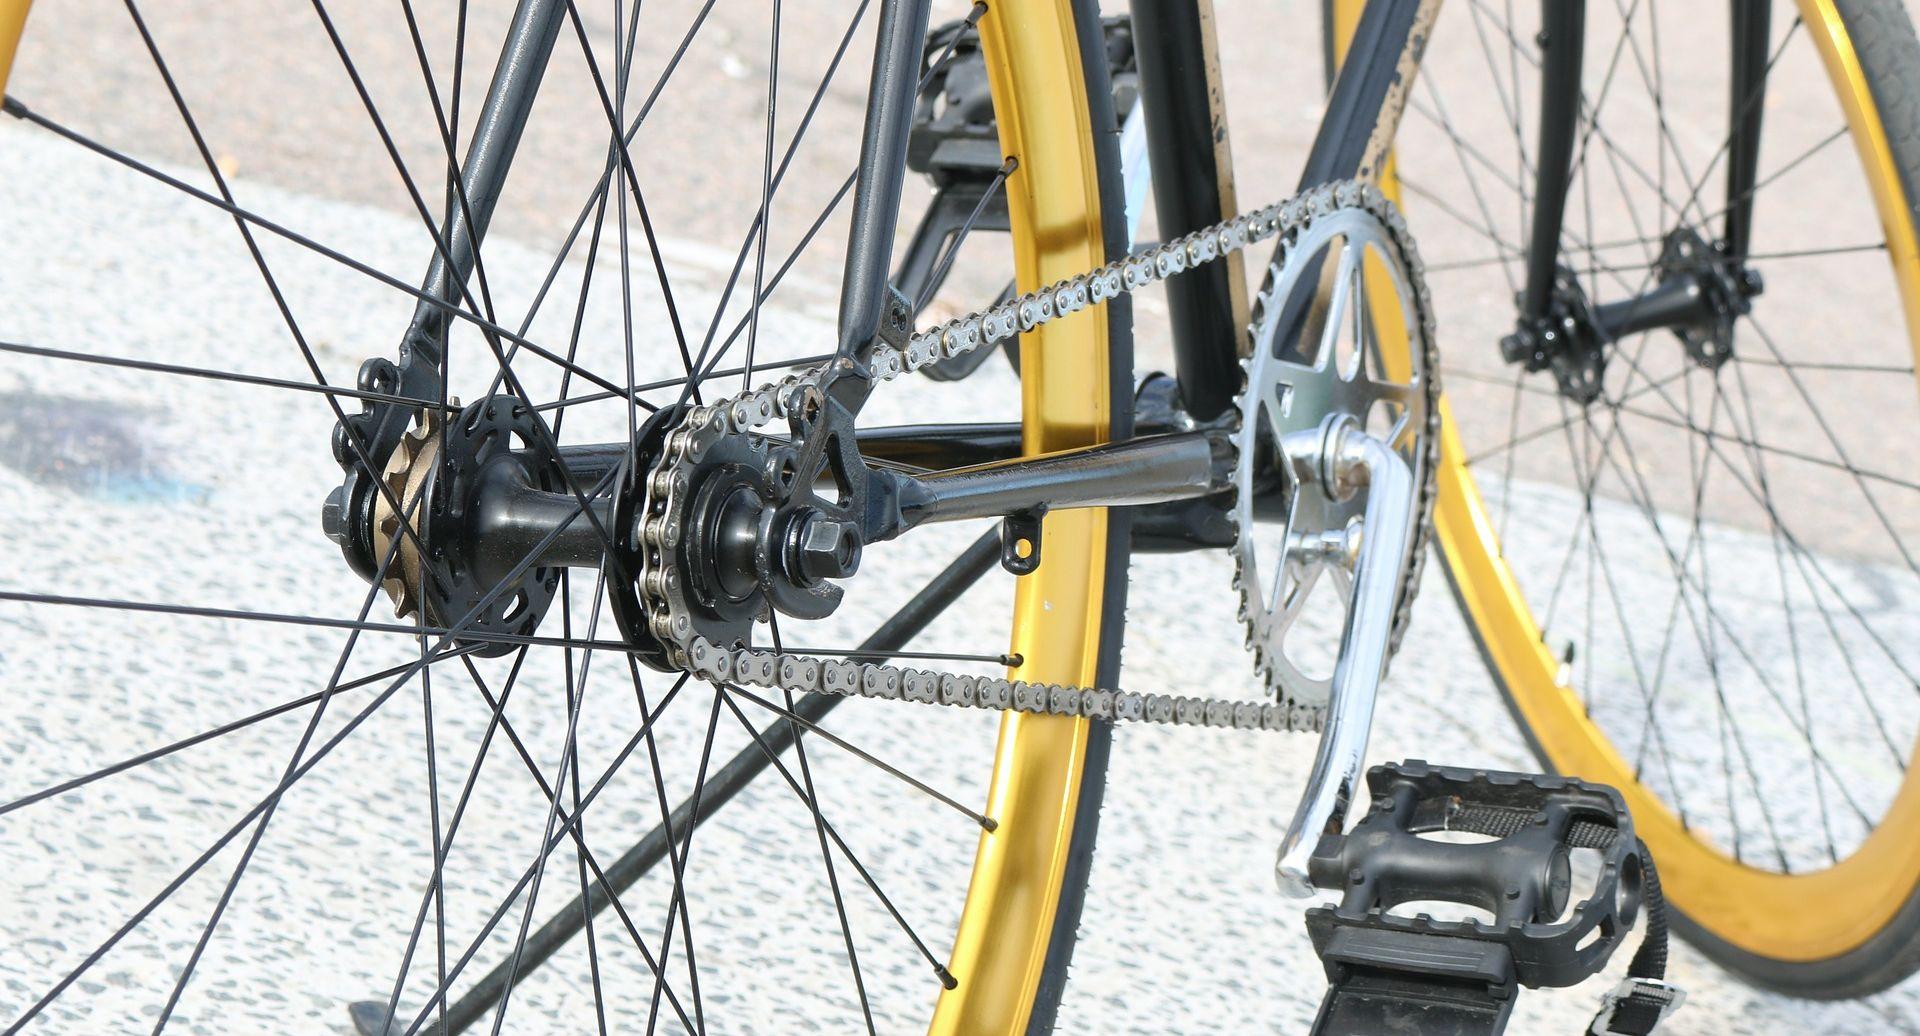 Zagreb: Pao s bicikla i poginuo